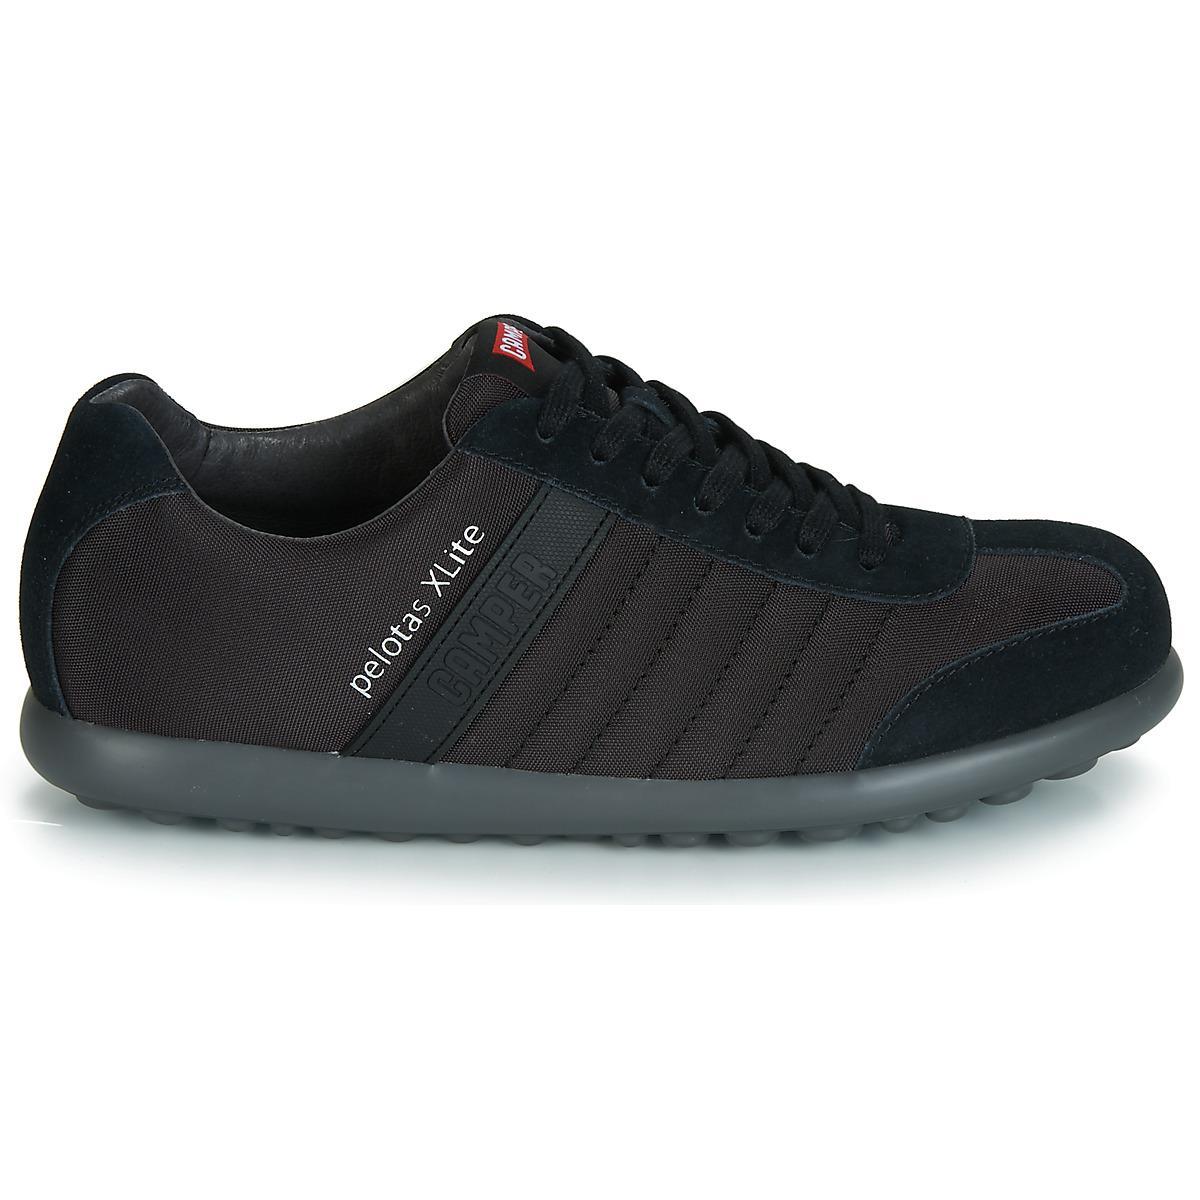 Camper - Black Pelotas Xl Casual Shoes for Men - Lyst. View fullscreen ae866cb715b